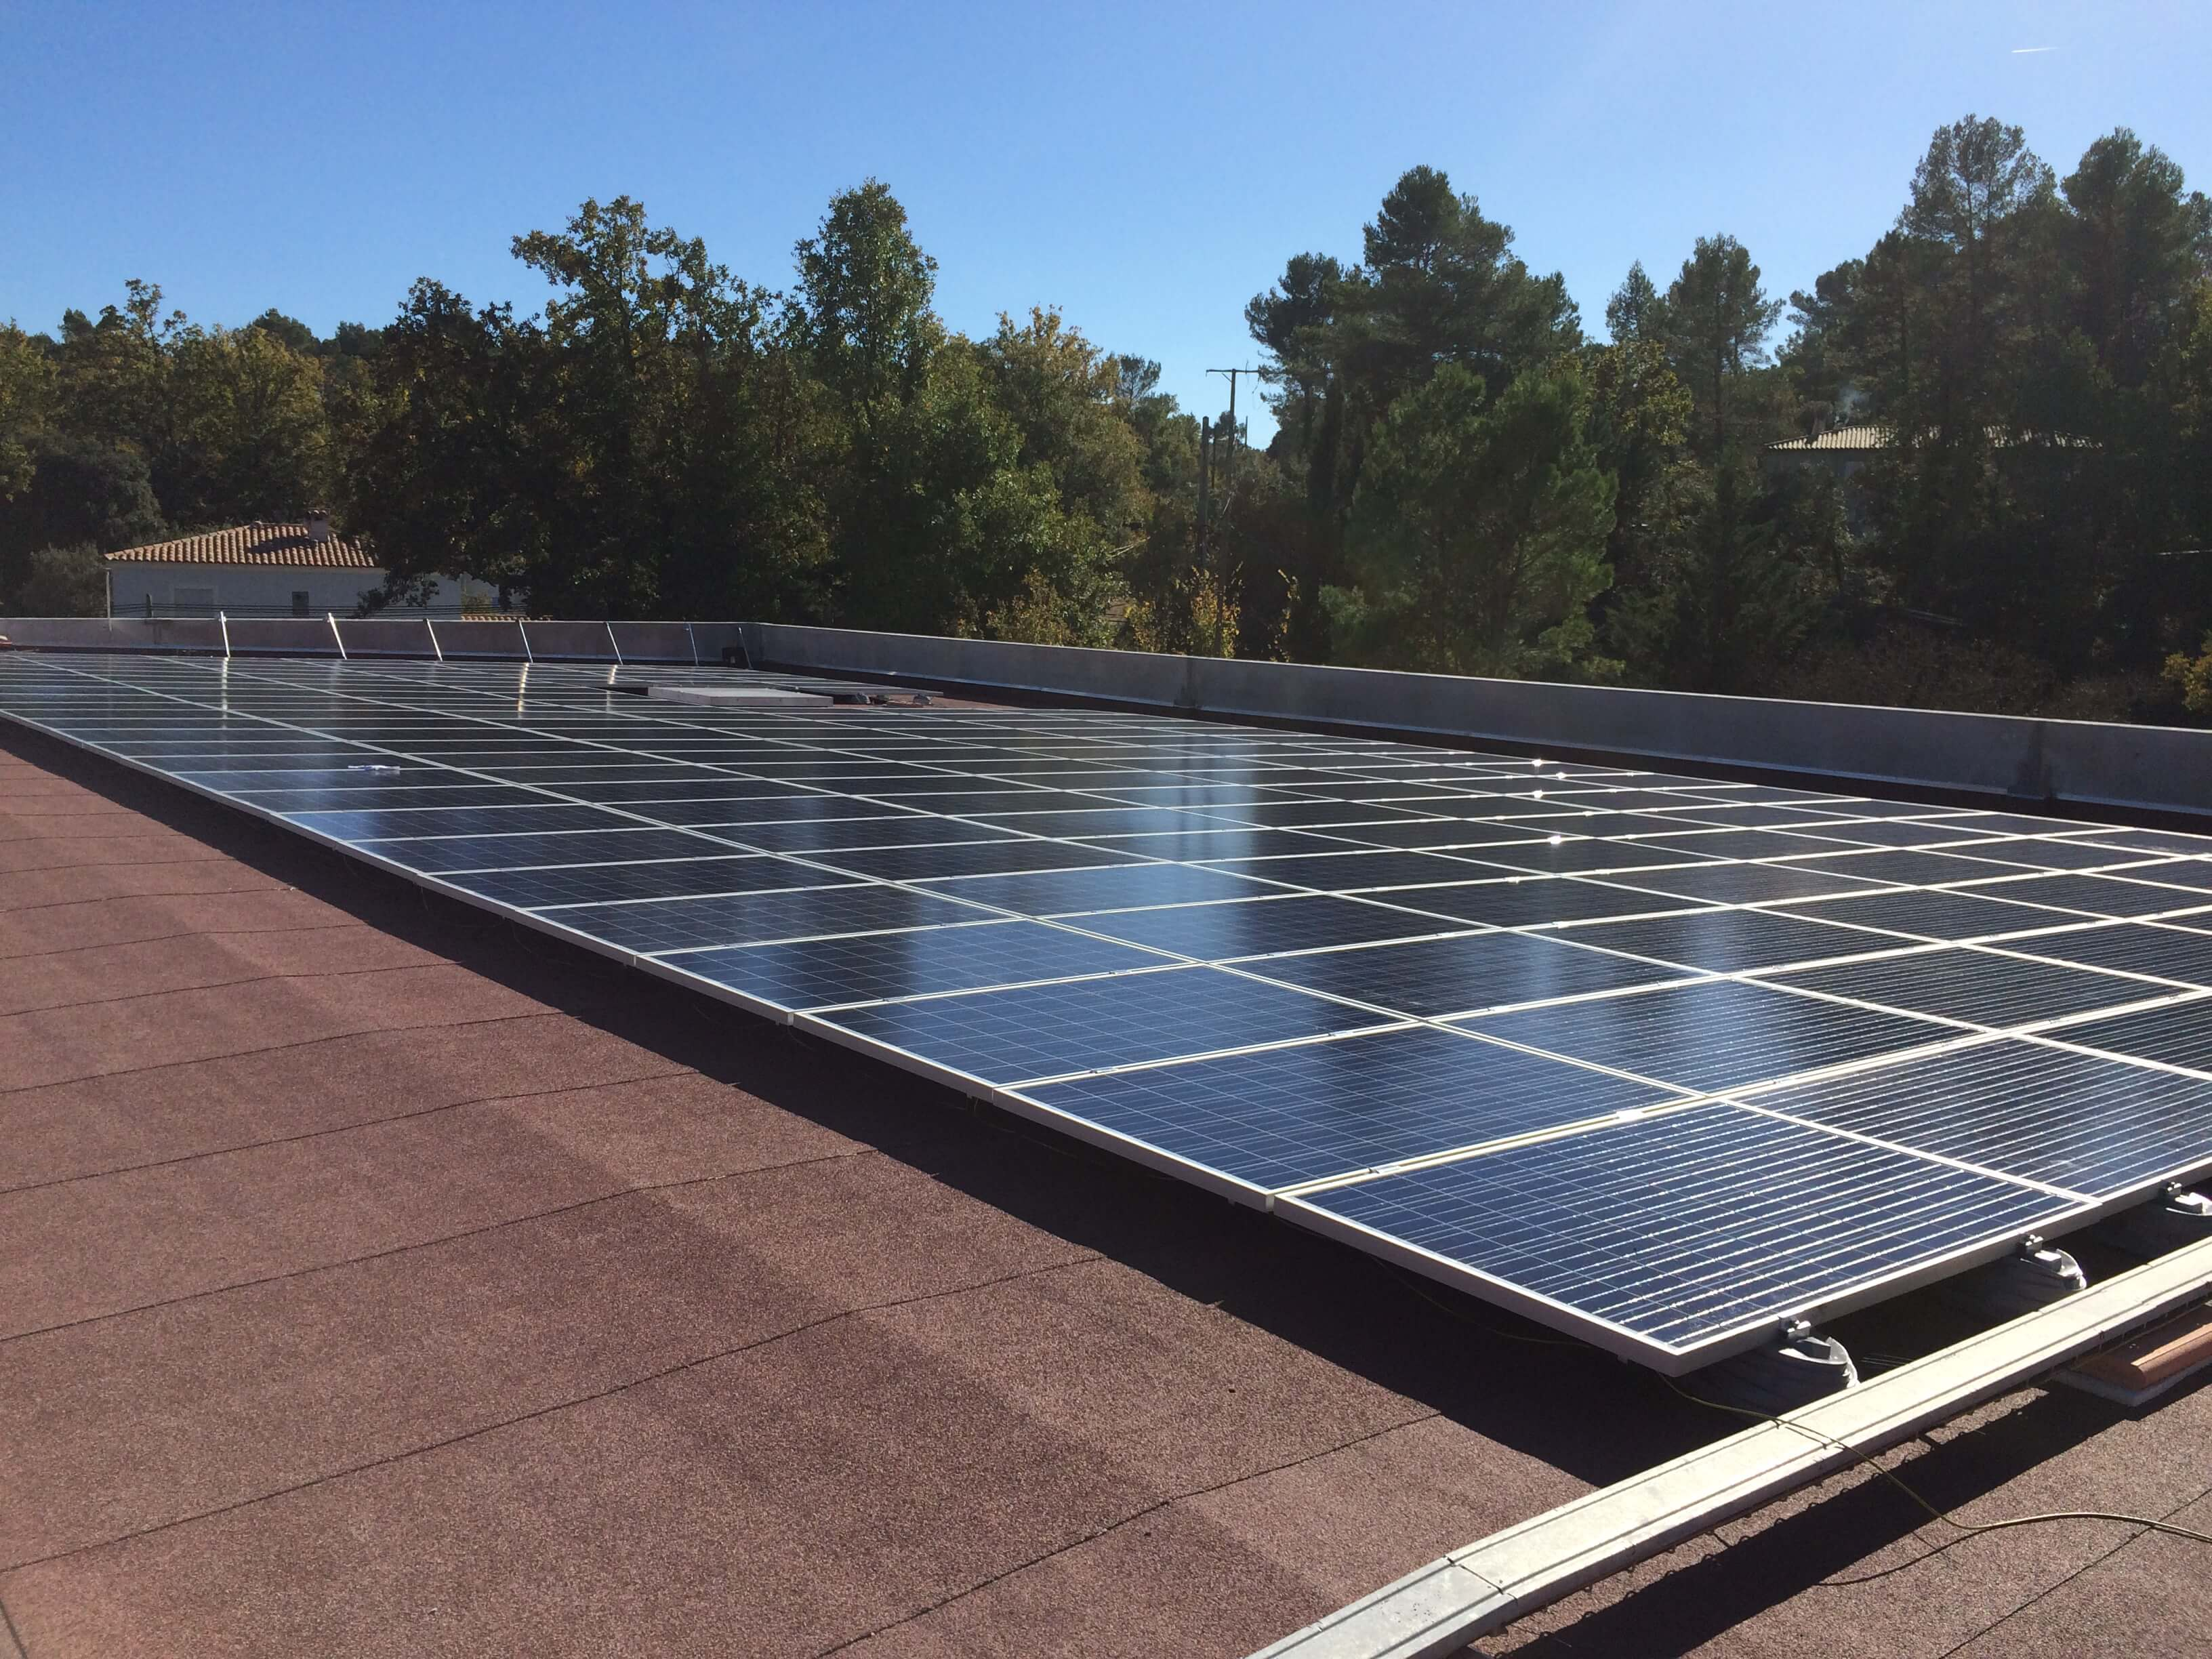 carrefour-contact-installation-photovoltaique